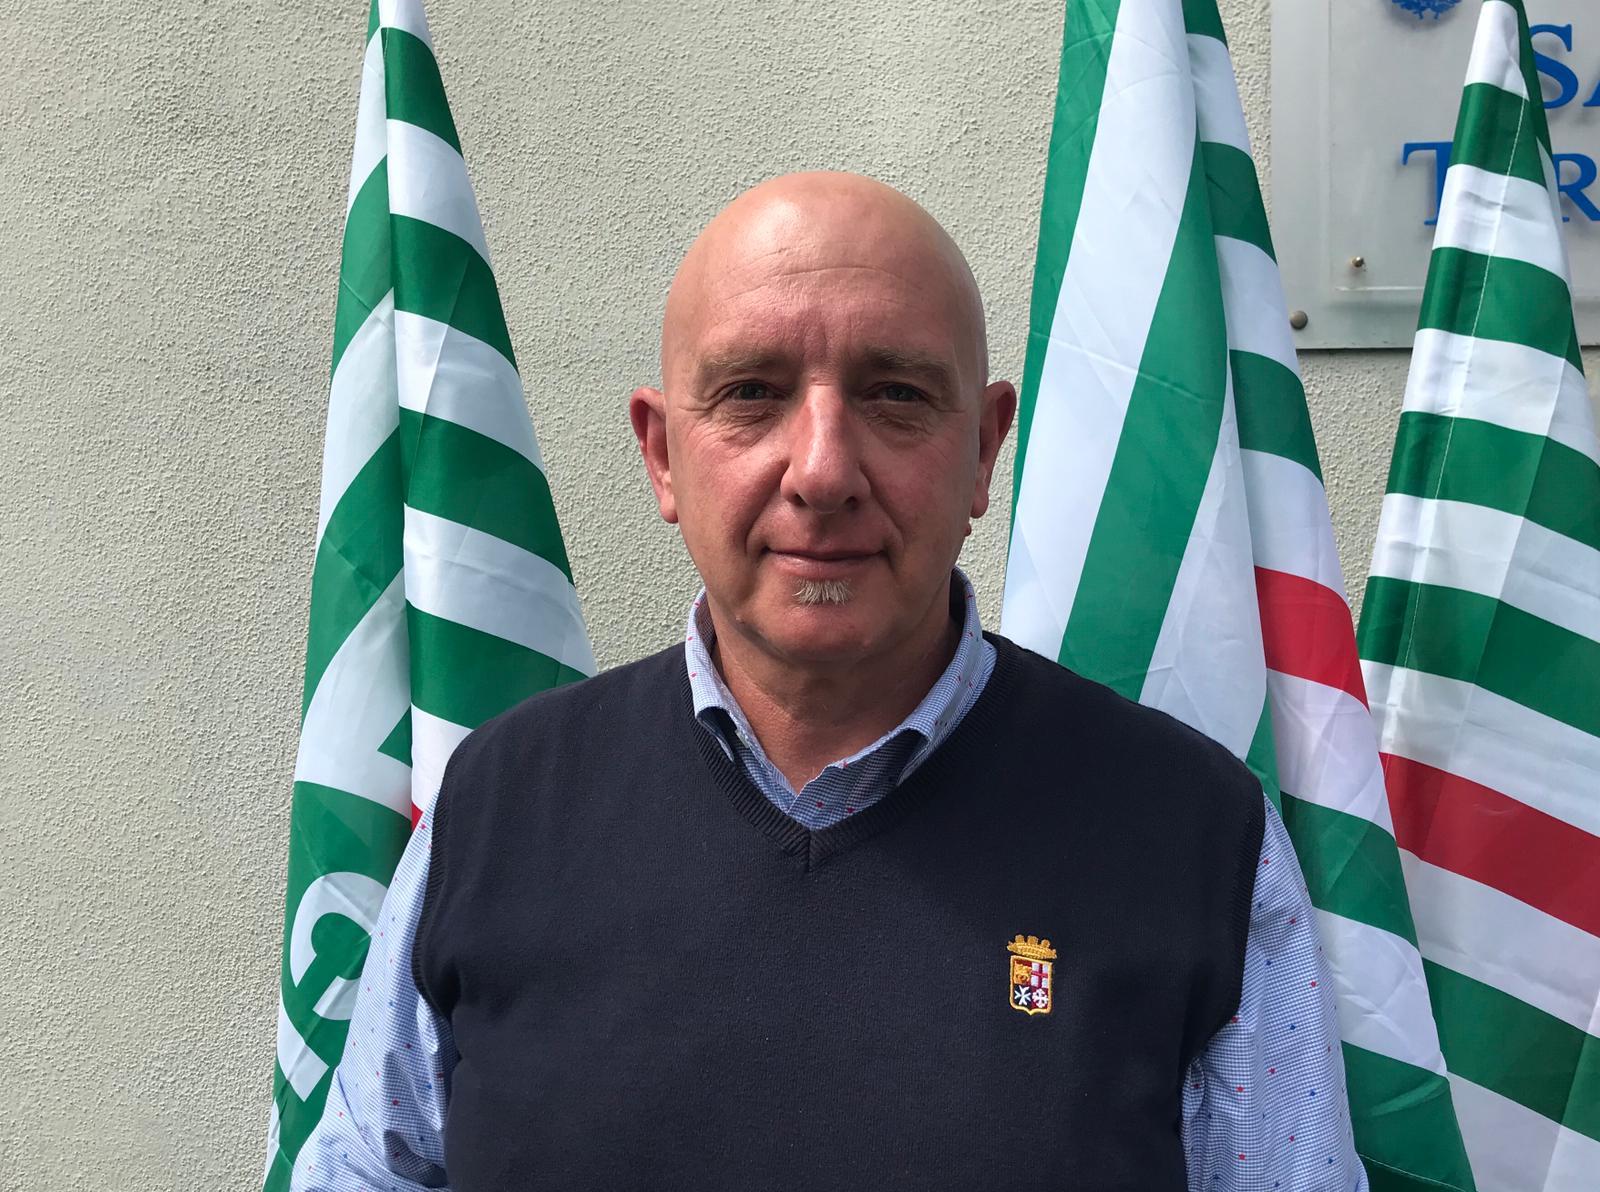 fabrizio-milani-segretario-provinciale-cisl.